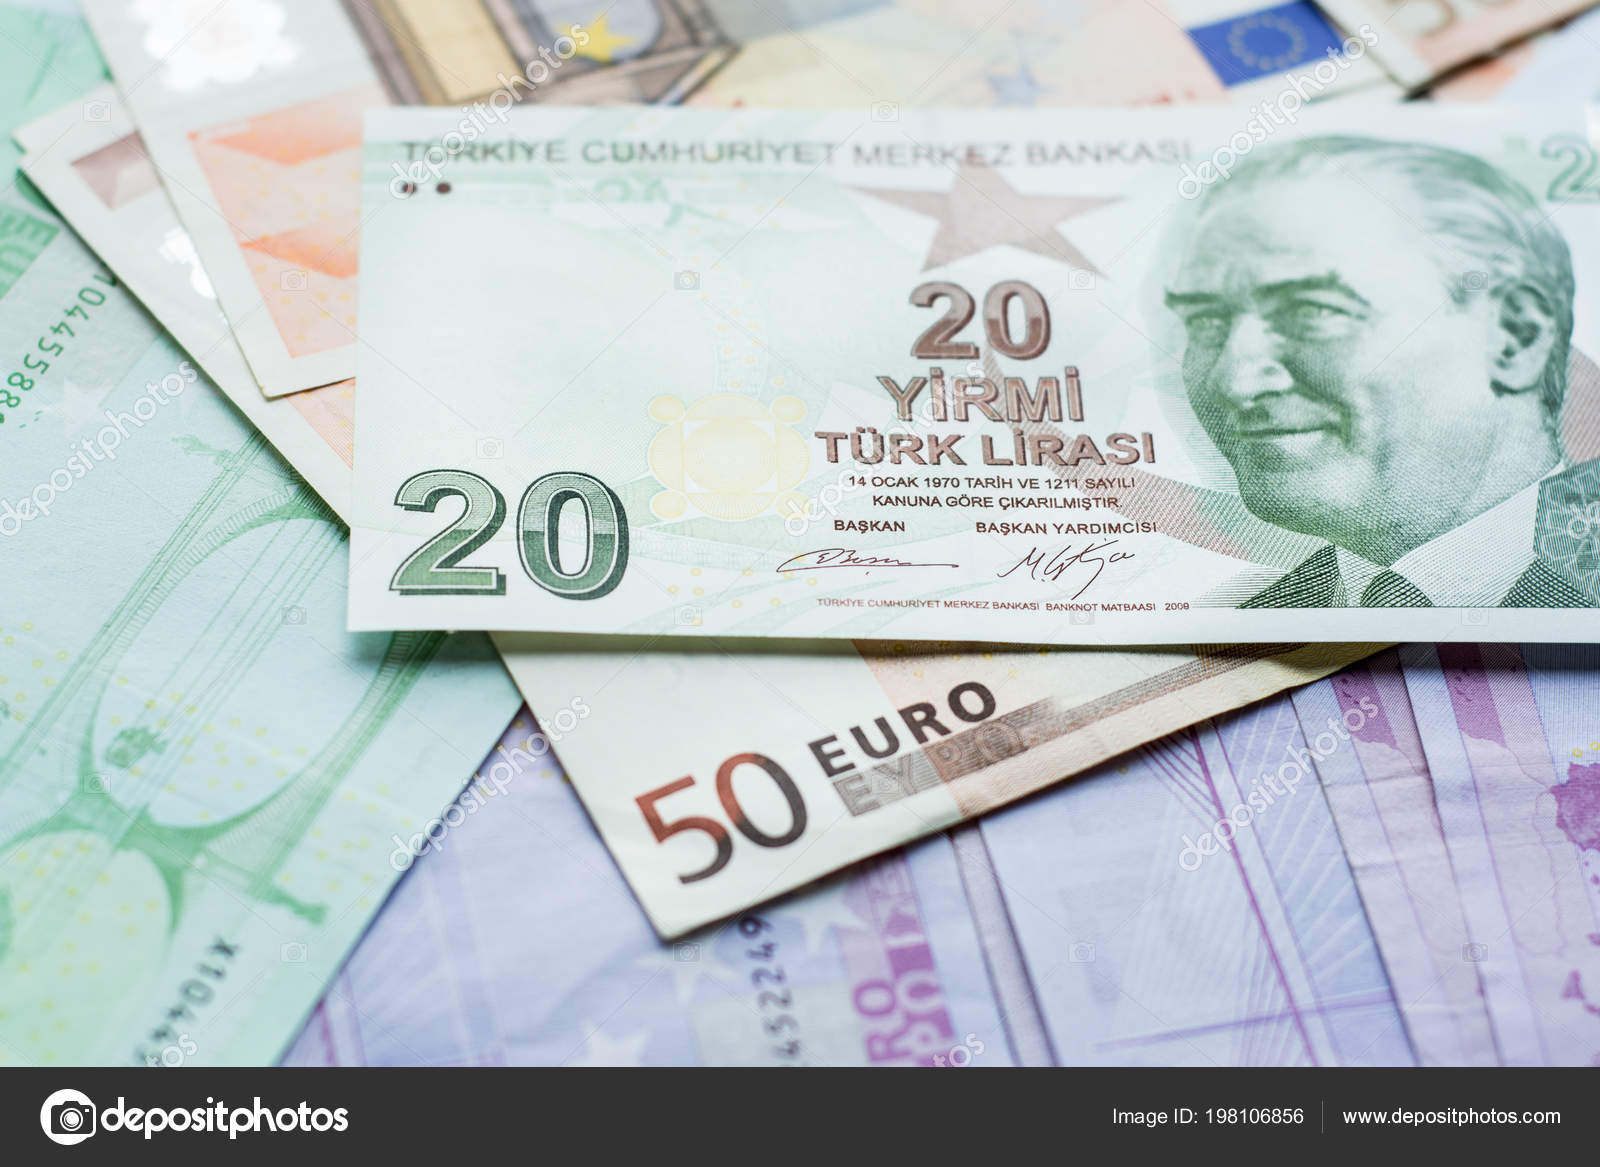 yapi-kredi-ve-is-bankasindan-borclanma-araci-ihraci-karari